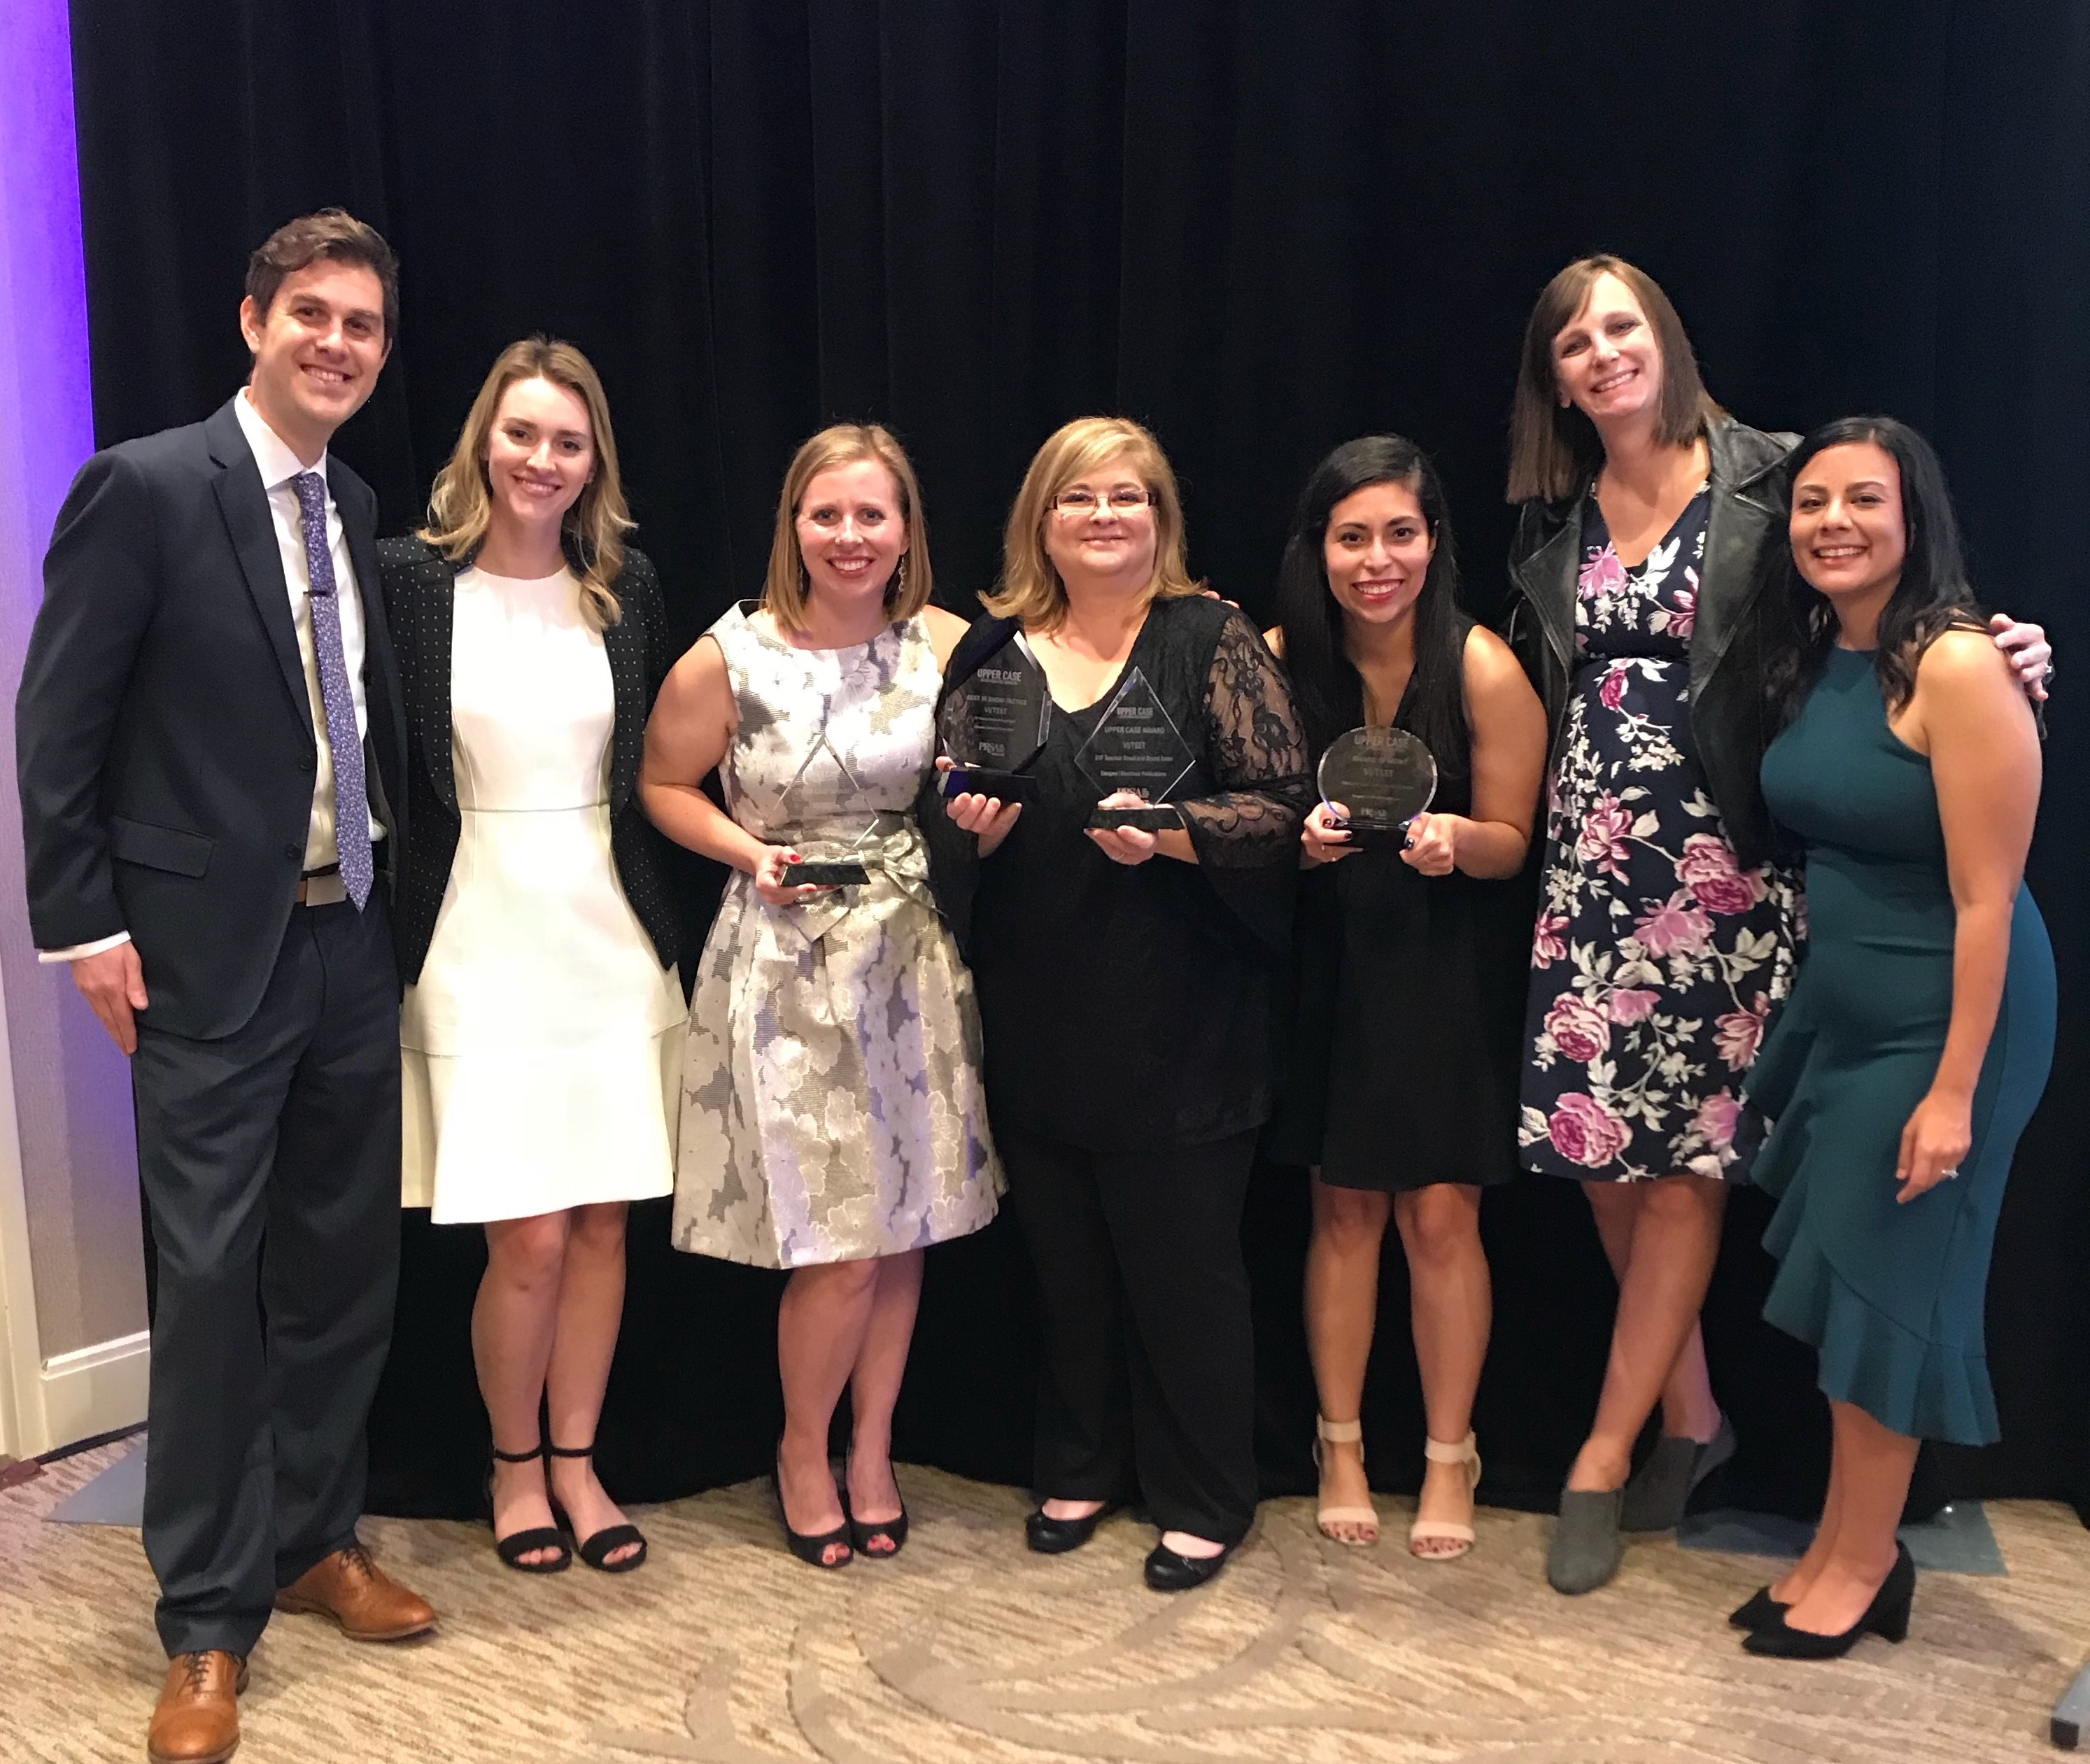 VI team with awards